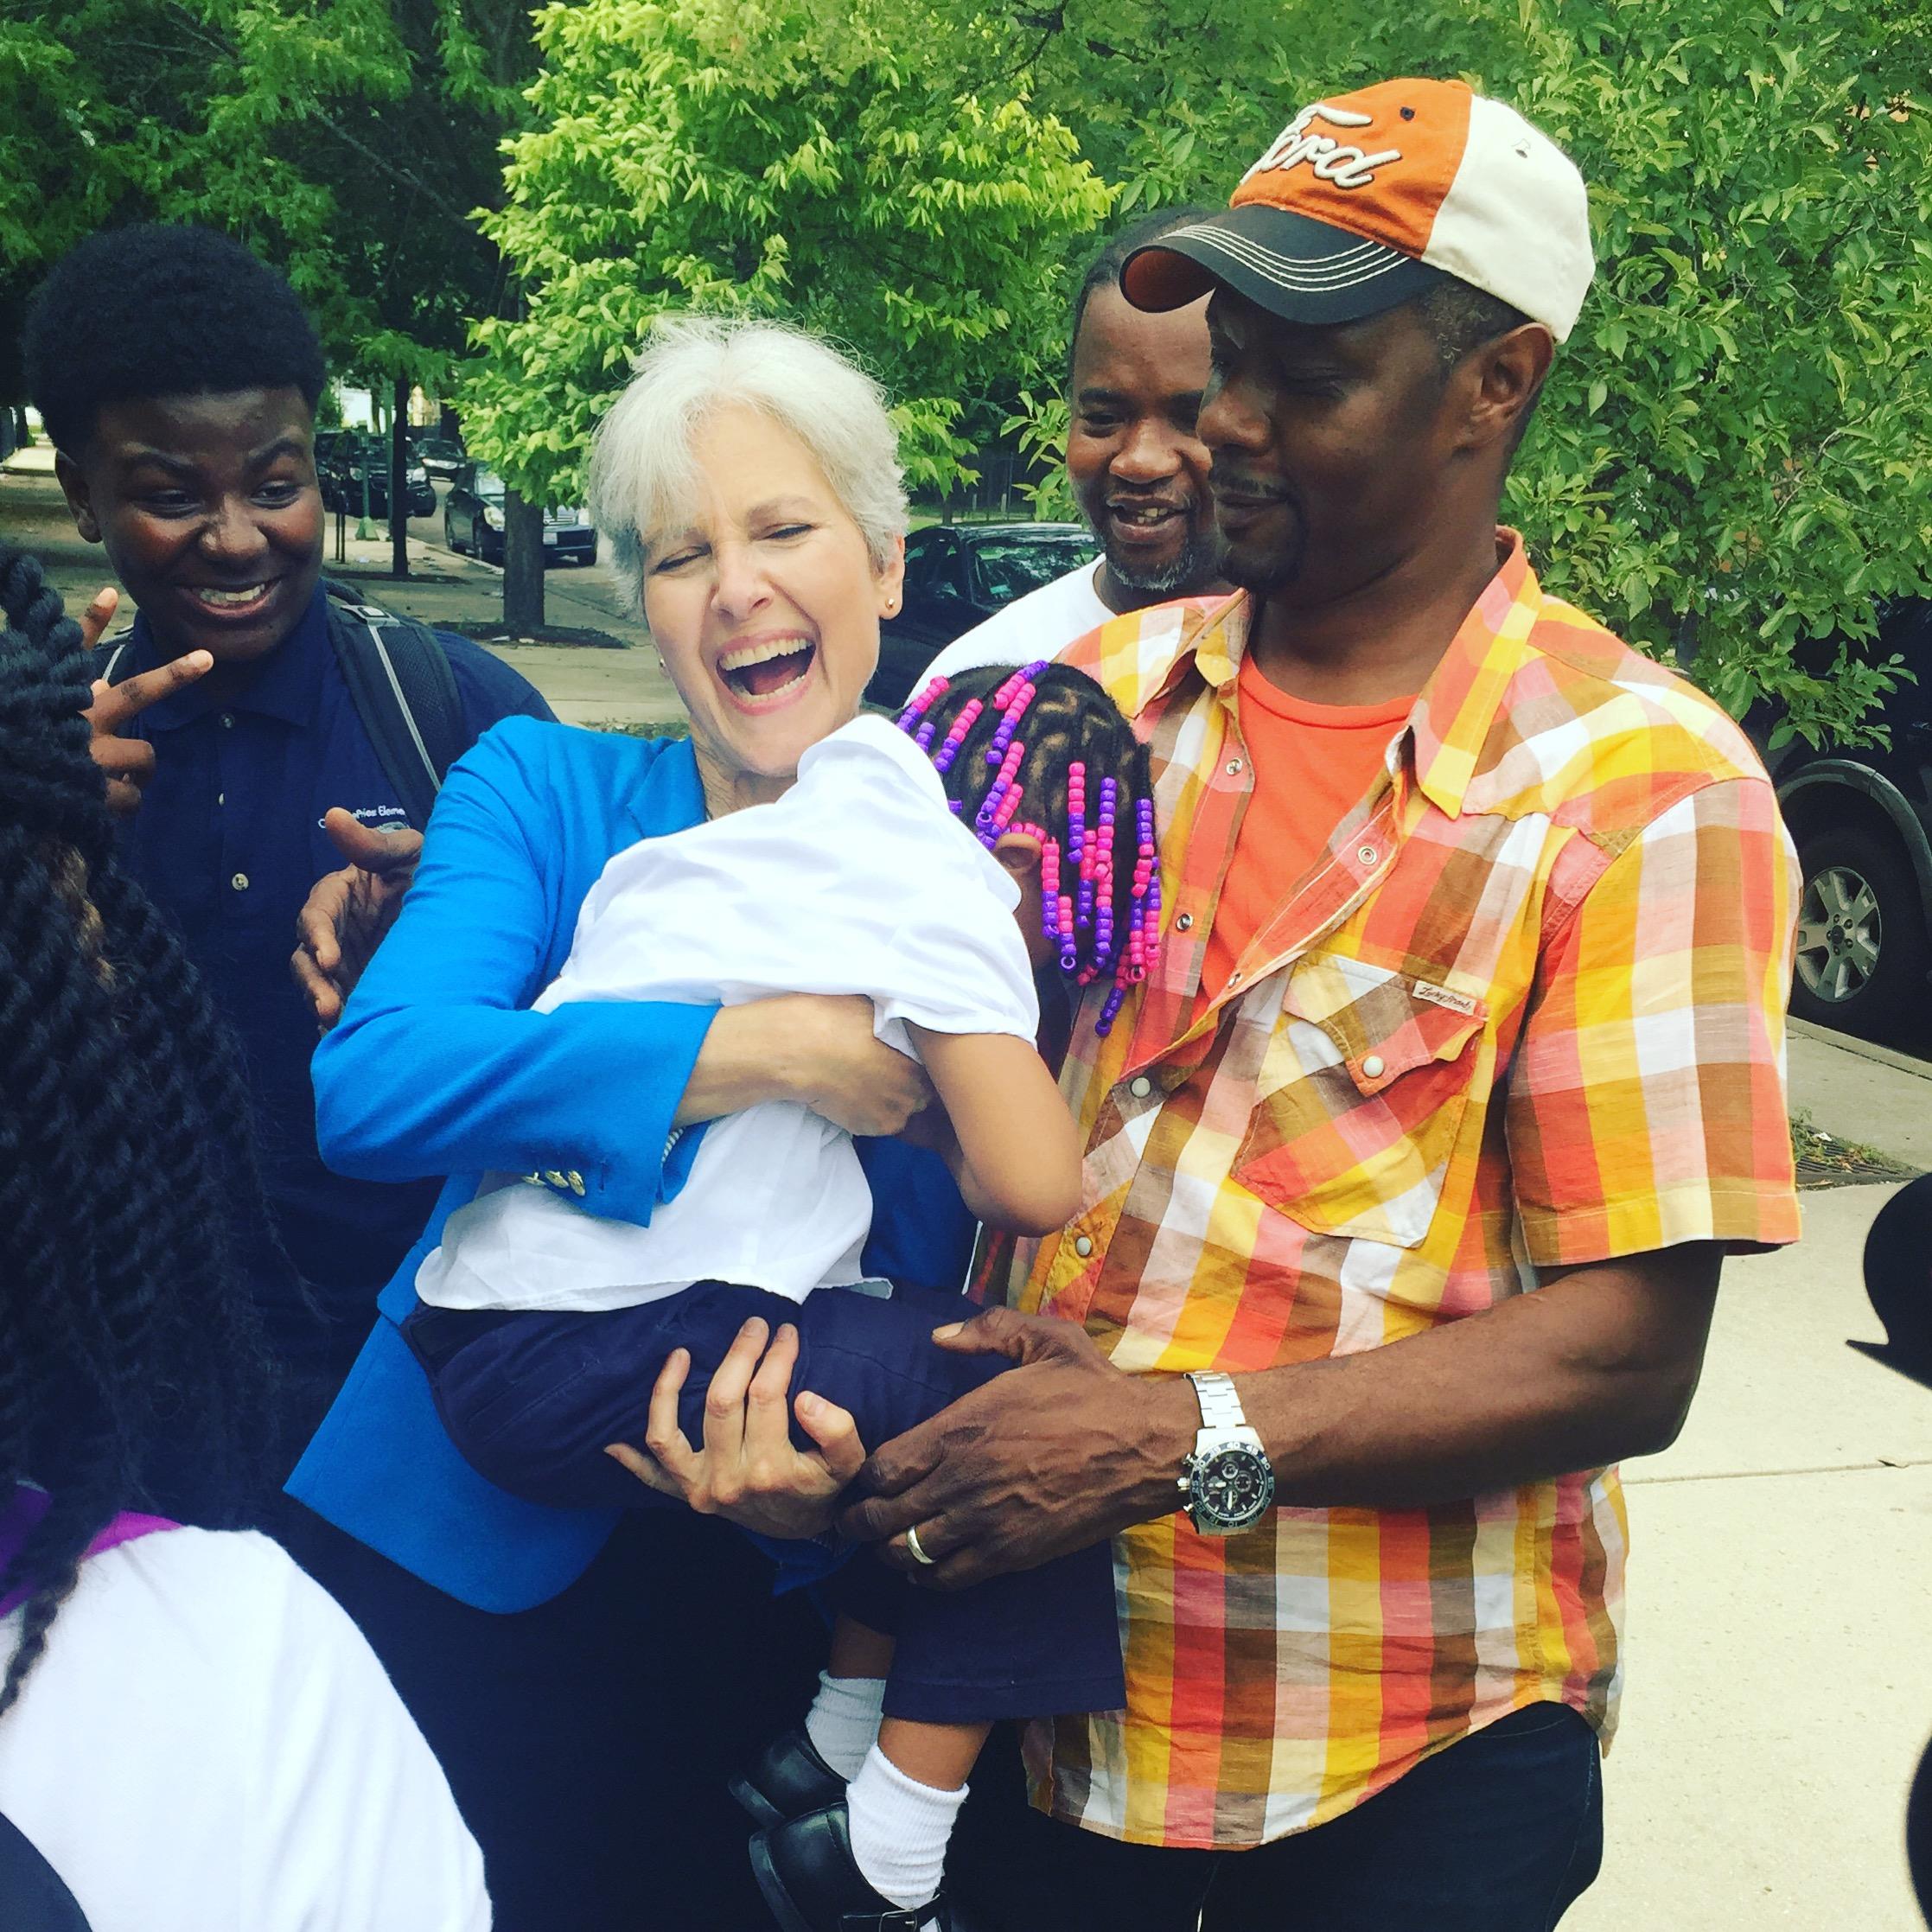 Jill Stein holds the daughter of Austin resident Jonathan Todd.